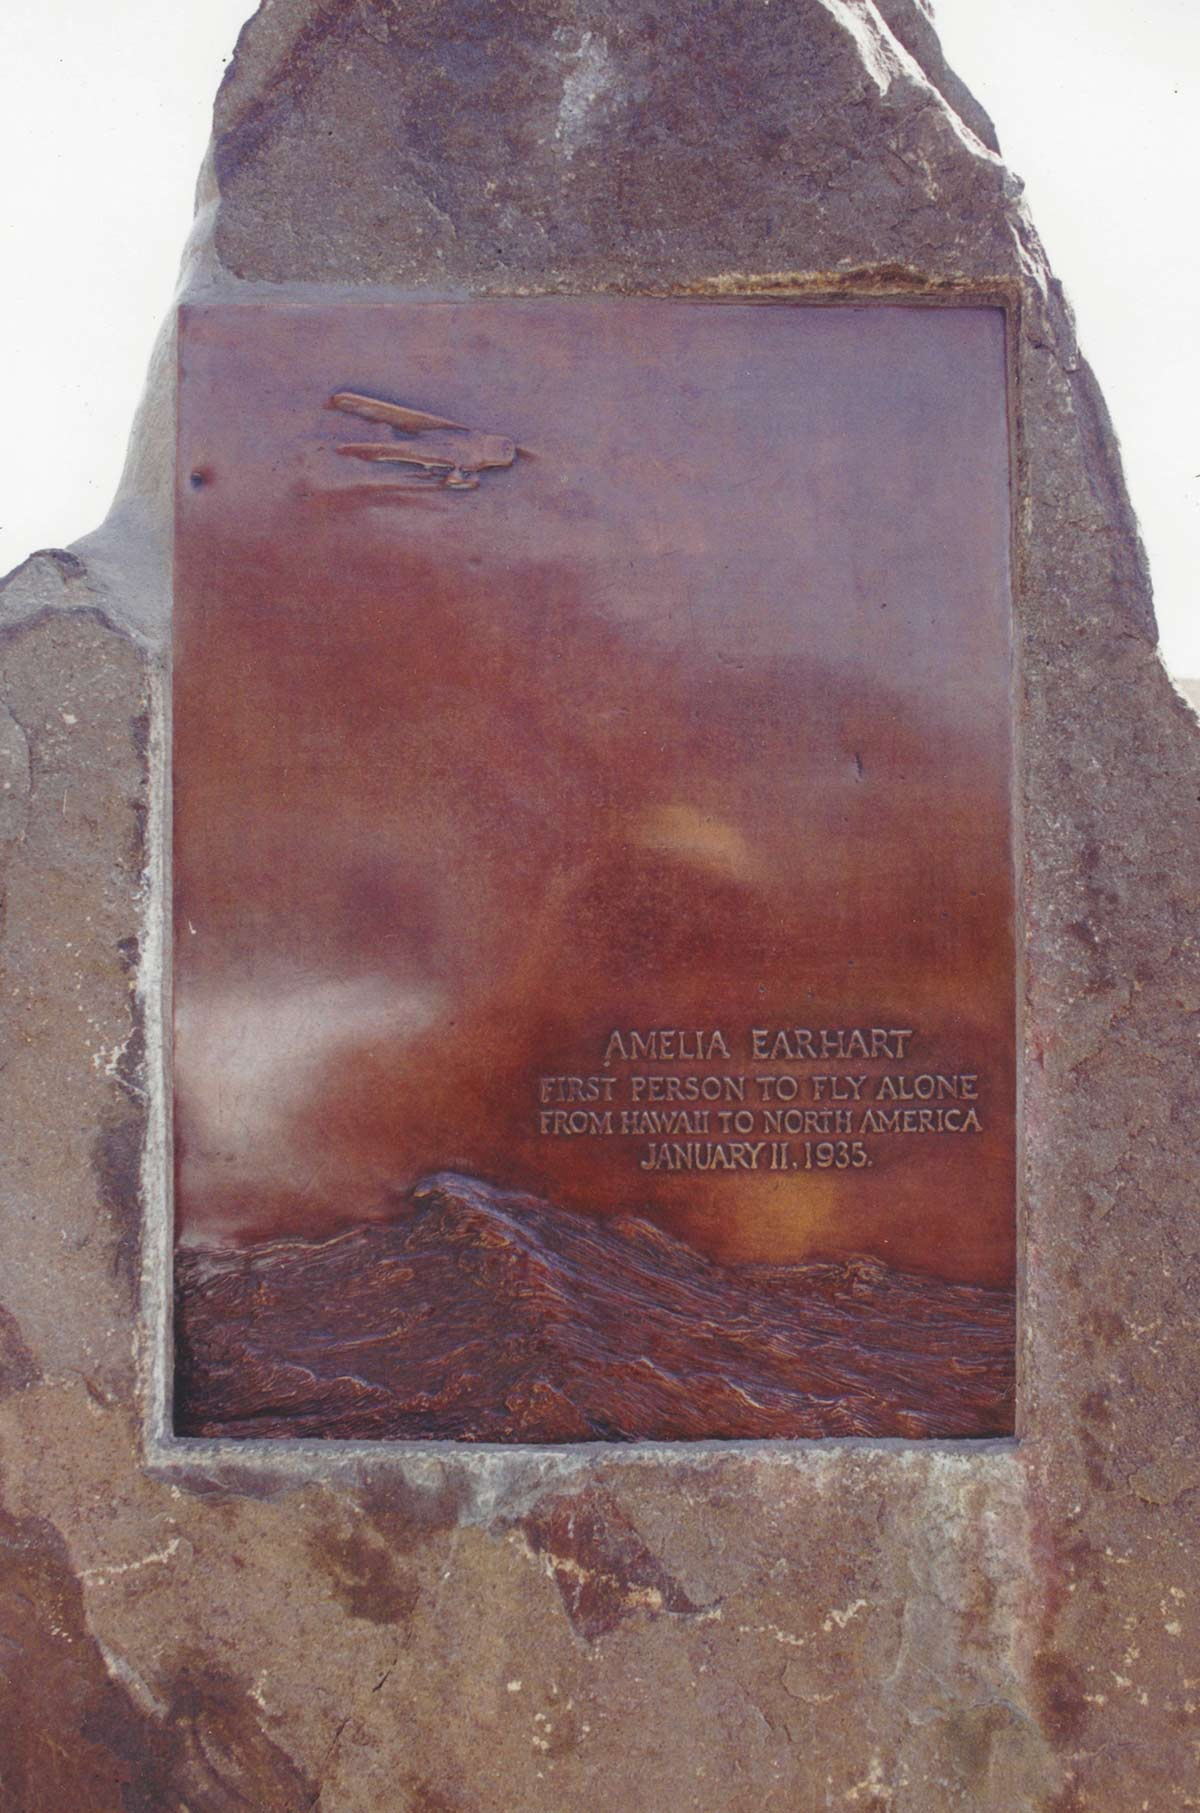 Plaque commemorates Amelia Earhart